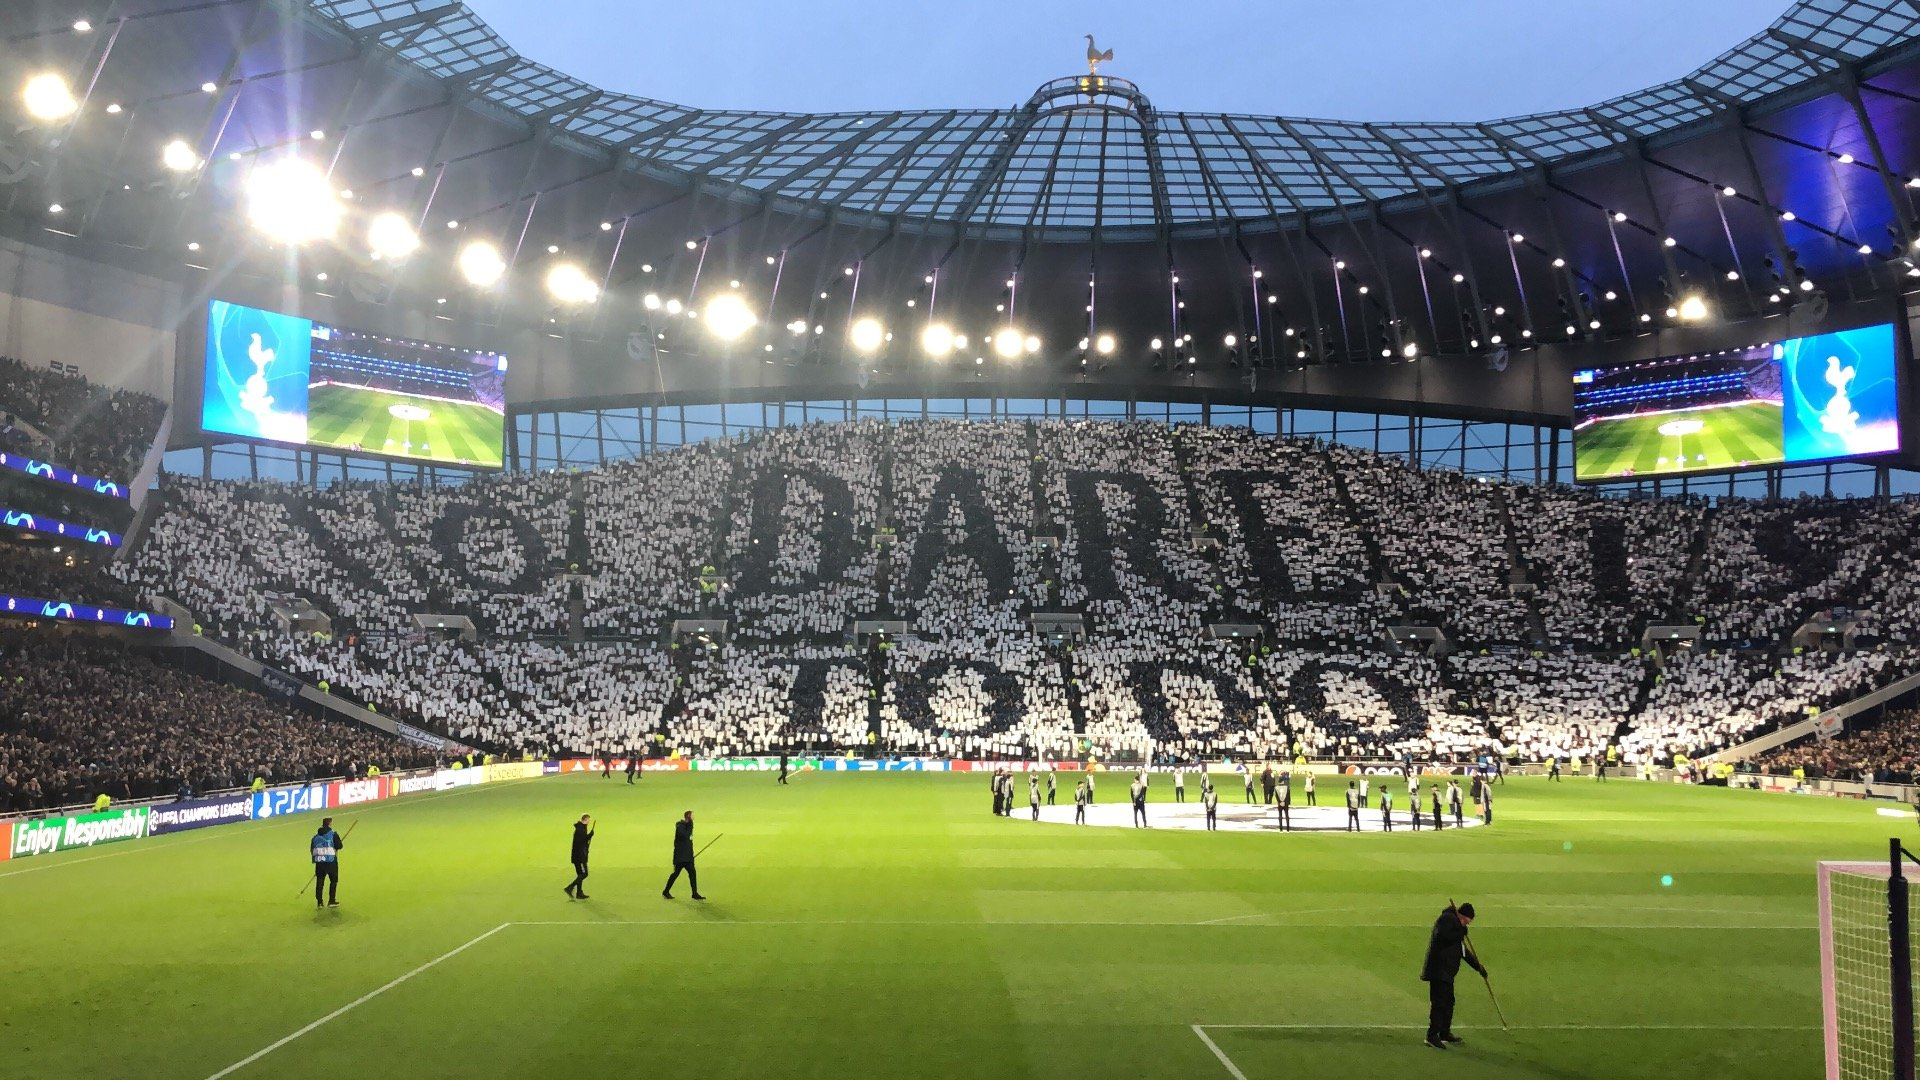 Tottenham Hotspur Stadium Section 113 Row 13 Seat 394 Tottenham Hotspur Vs Manchester City Fc Shared Anonymously